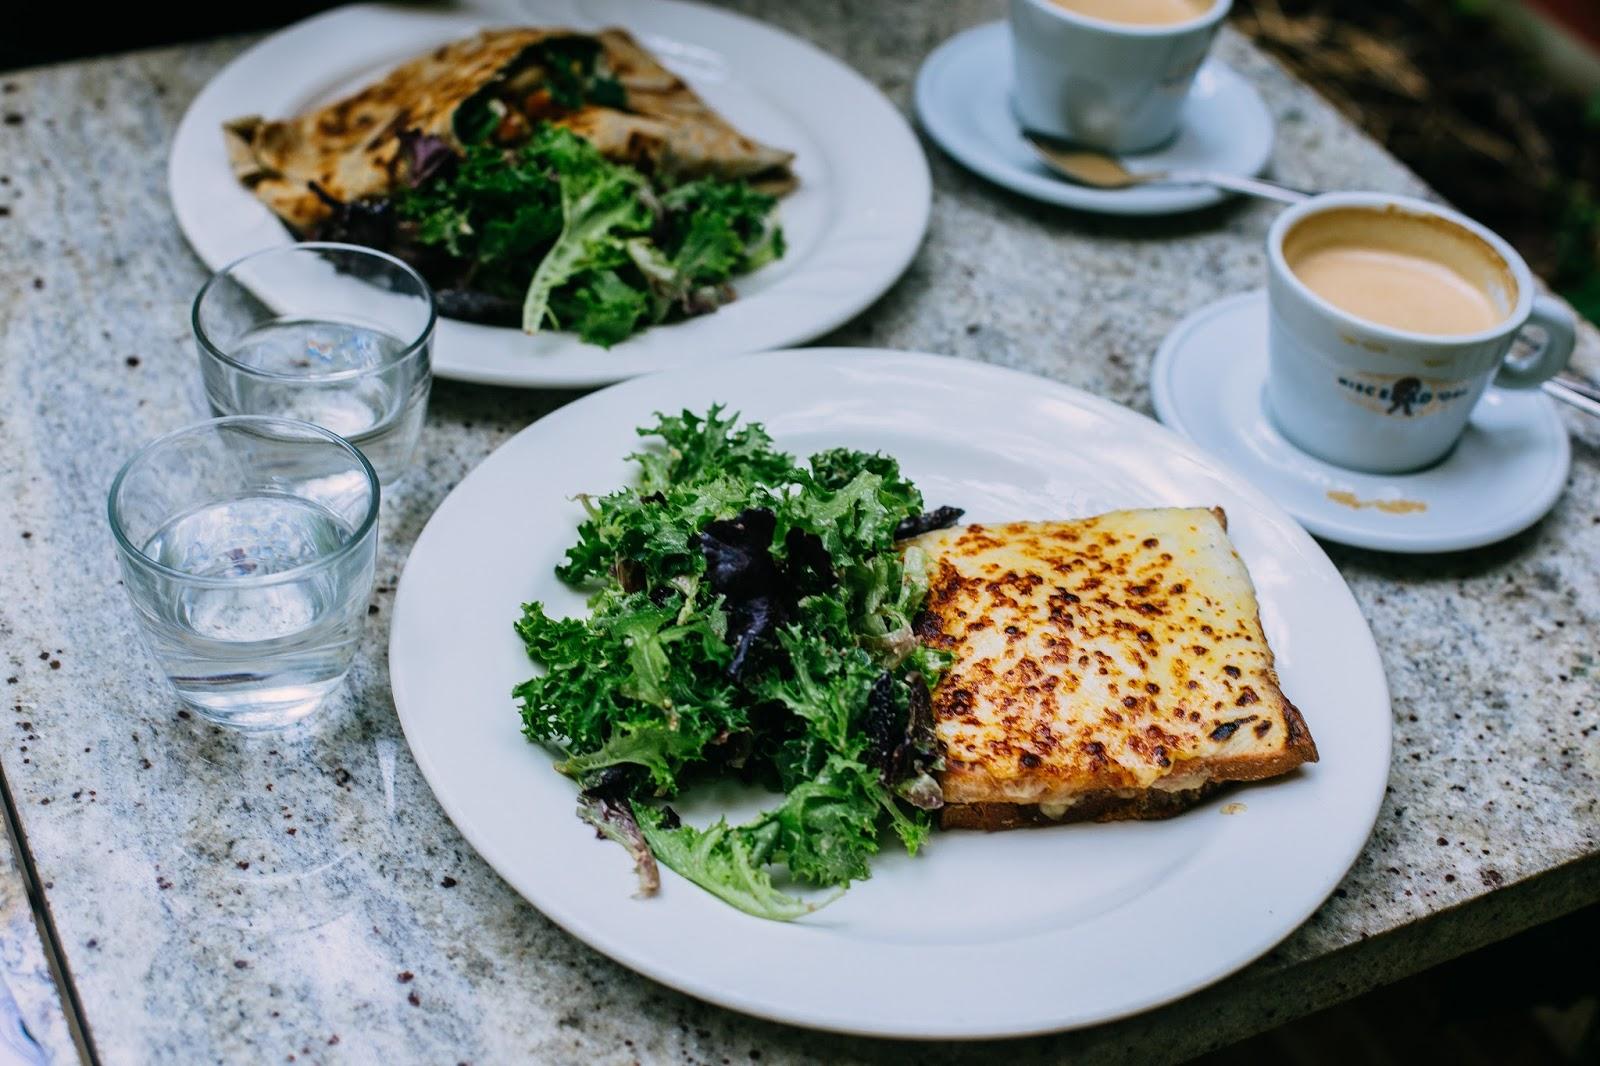 legamin-cafe-brooklyn-fort-greene-croque-monsieur.jpg